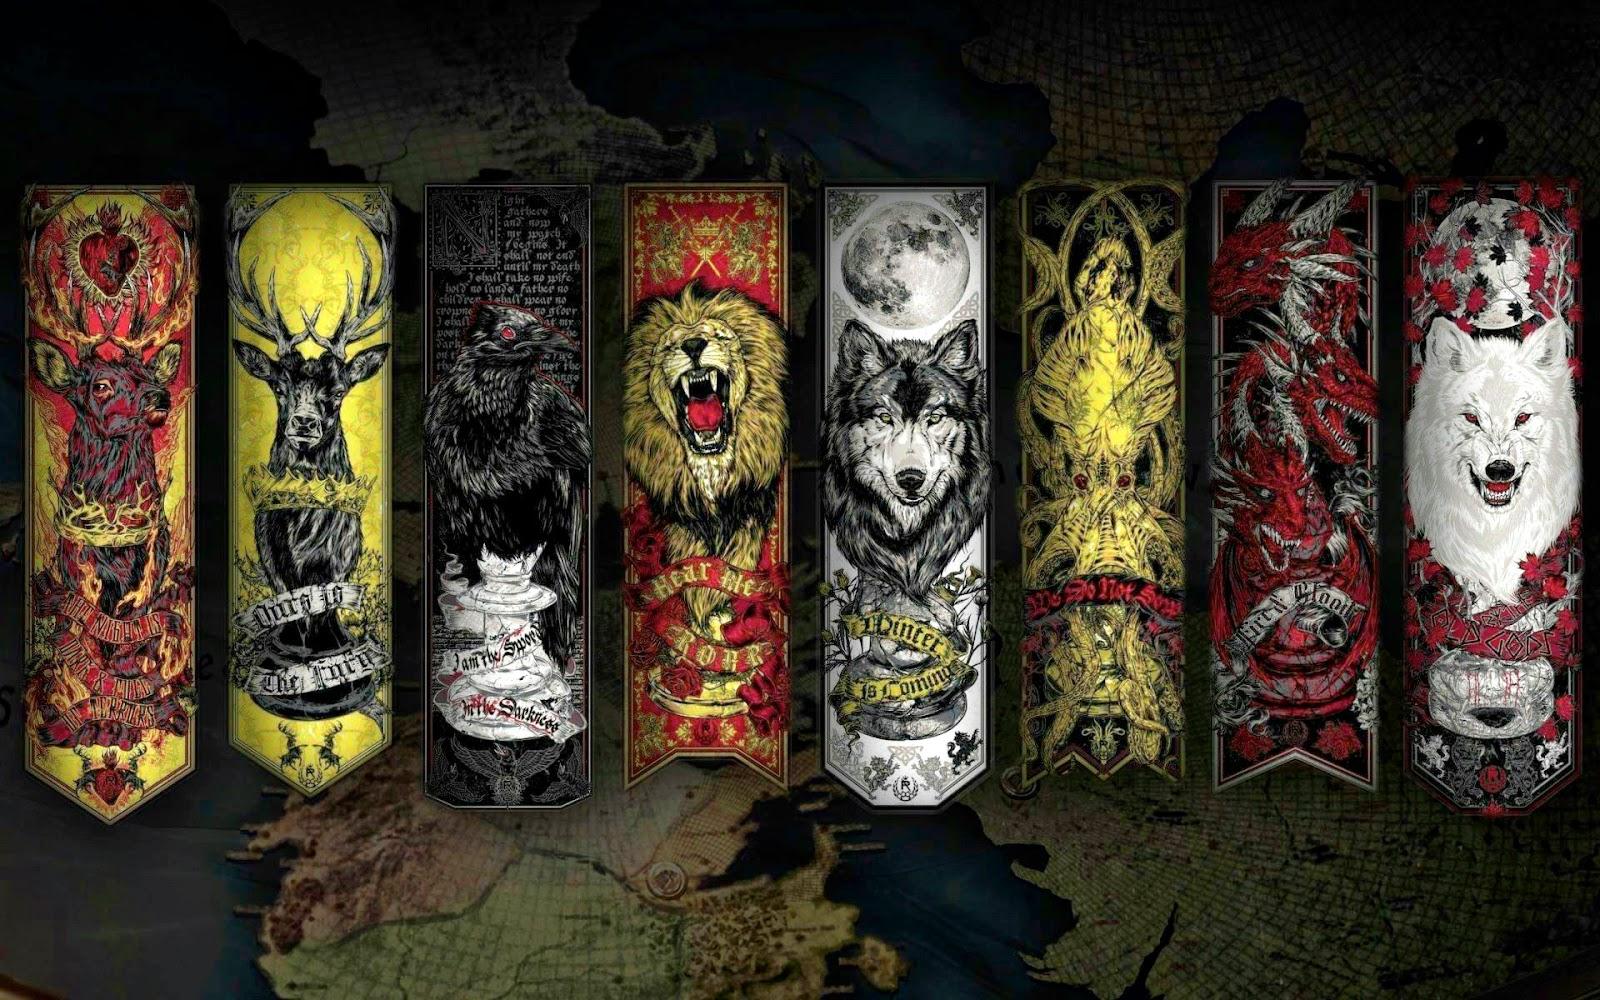 Papel de Parede do Seriado HBO Game of Thrones